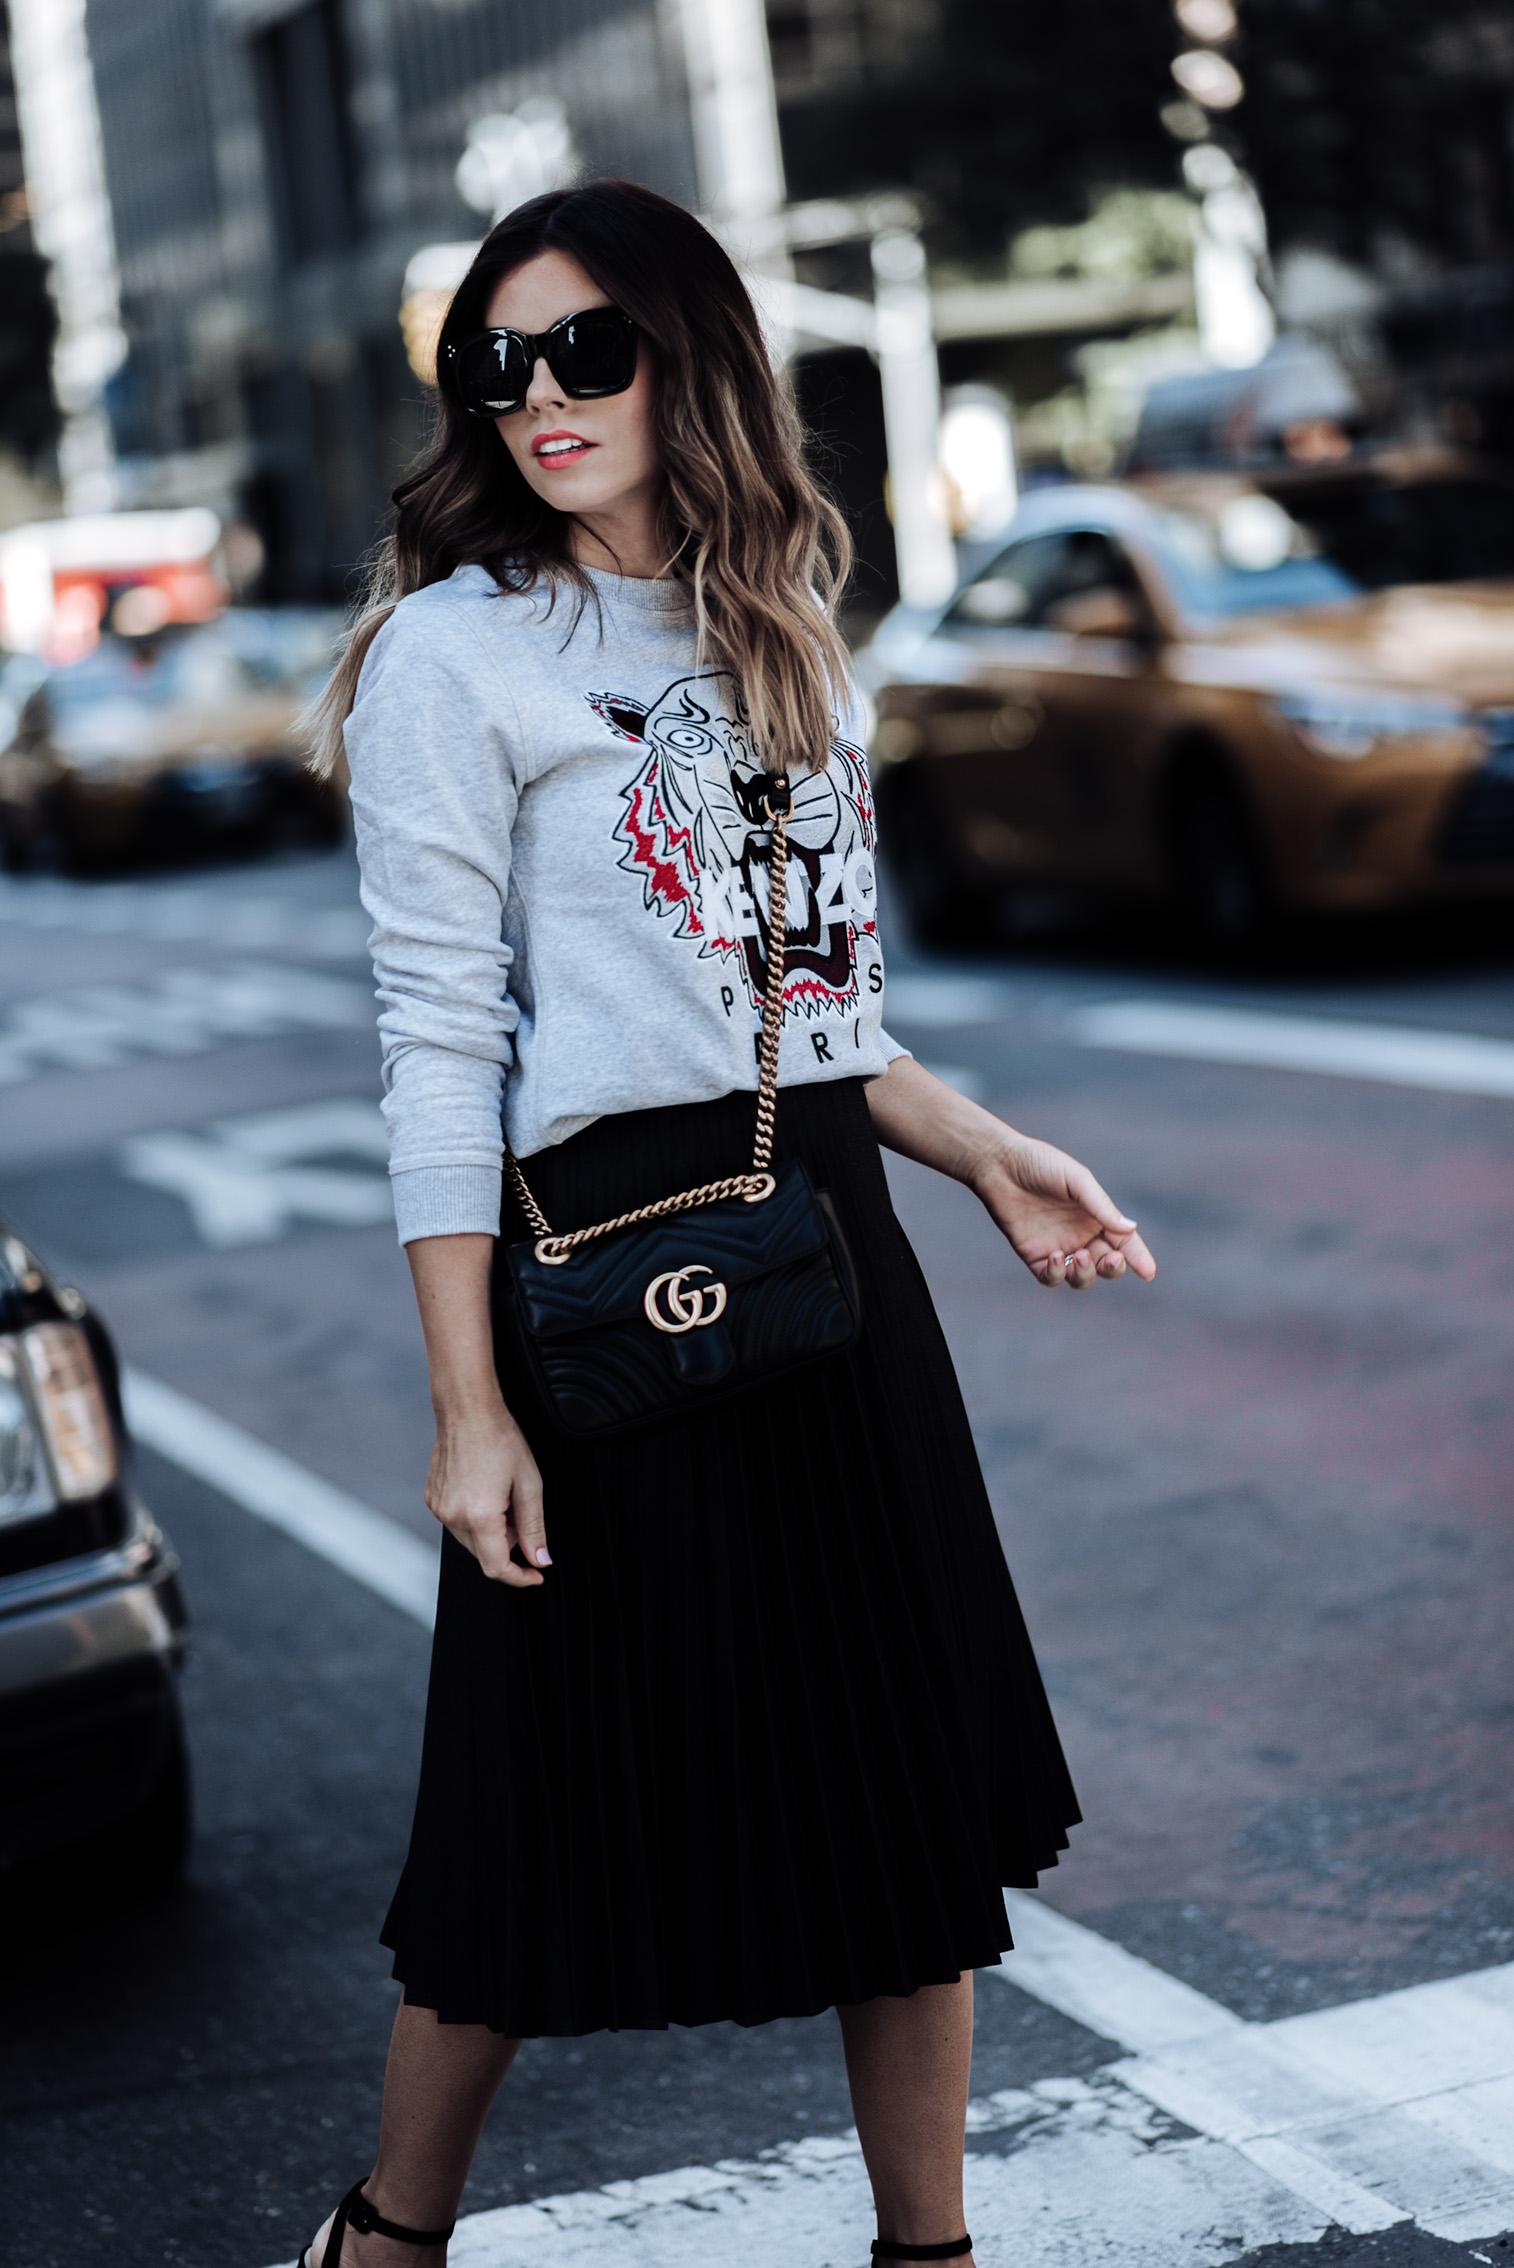 Tiffany Jais fashion and lifestyle blogger of Flaunt and Center | Houston fashion blogger | NYFW day 2 outfit | Streetstyle blog Pleated skirt | Kenzo Sweatshirt | Platform heels | Gucci Marmont Bag